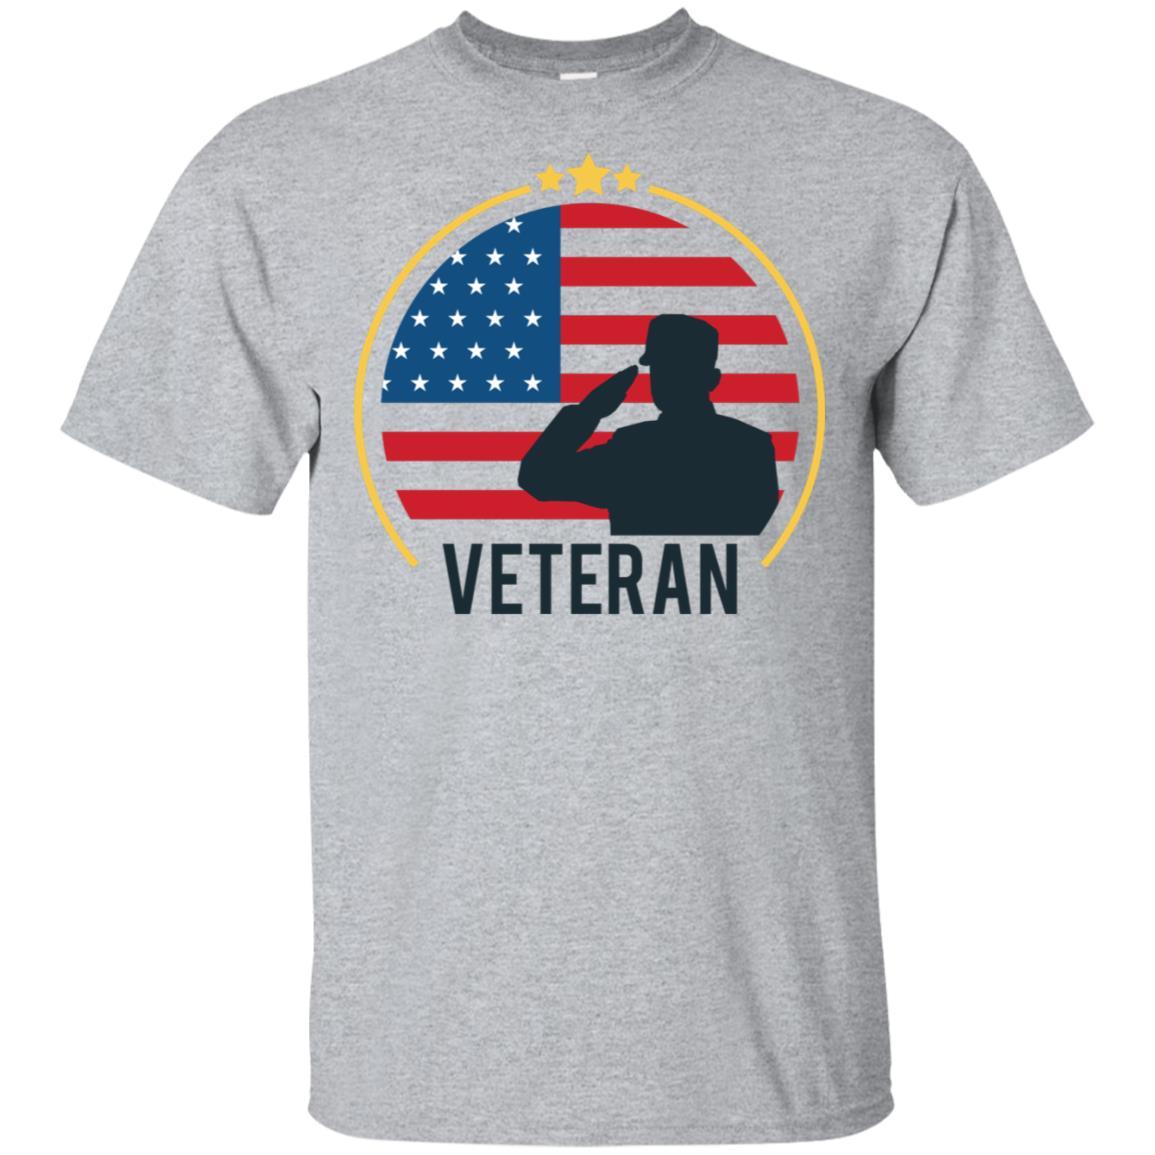 Veteran Army Usa Patriotic Unisex Short Sleeve